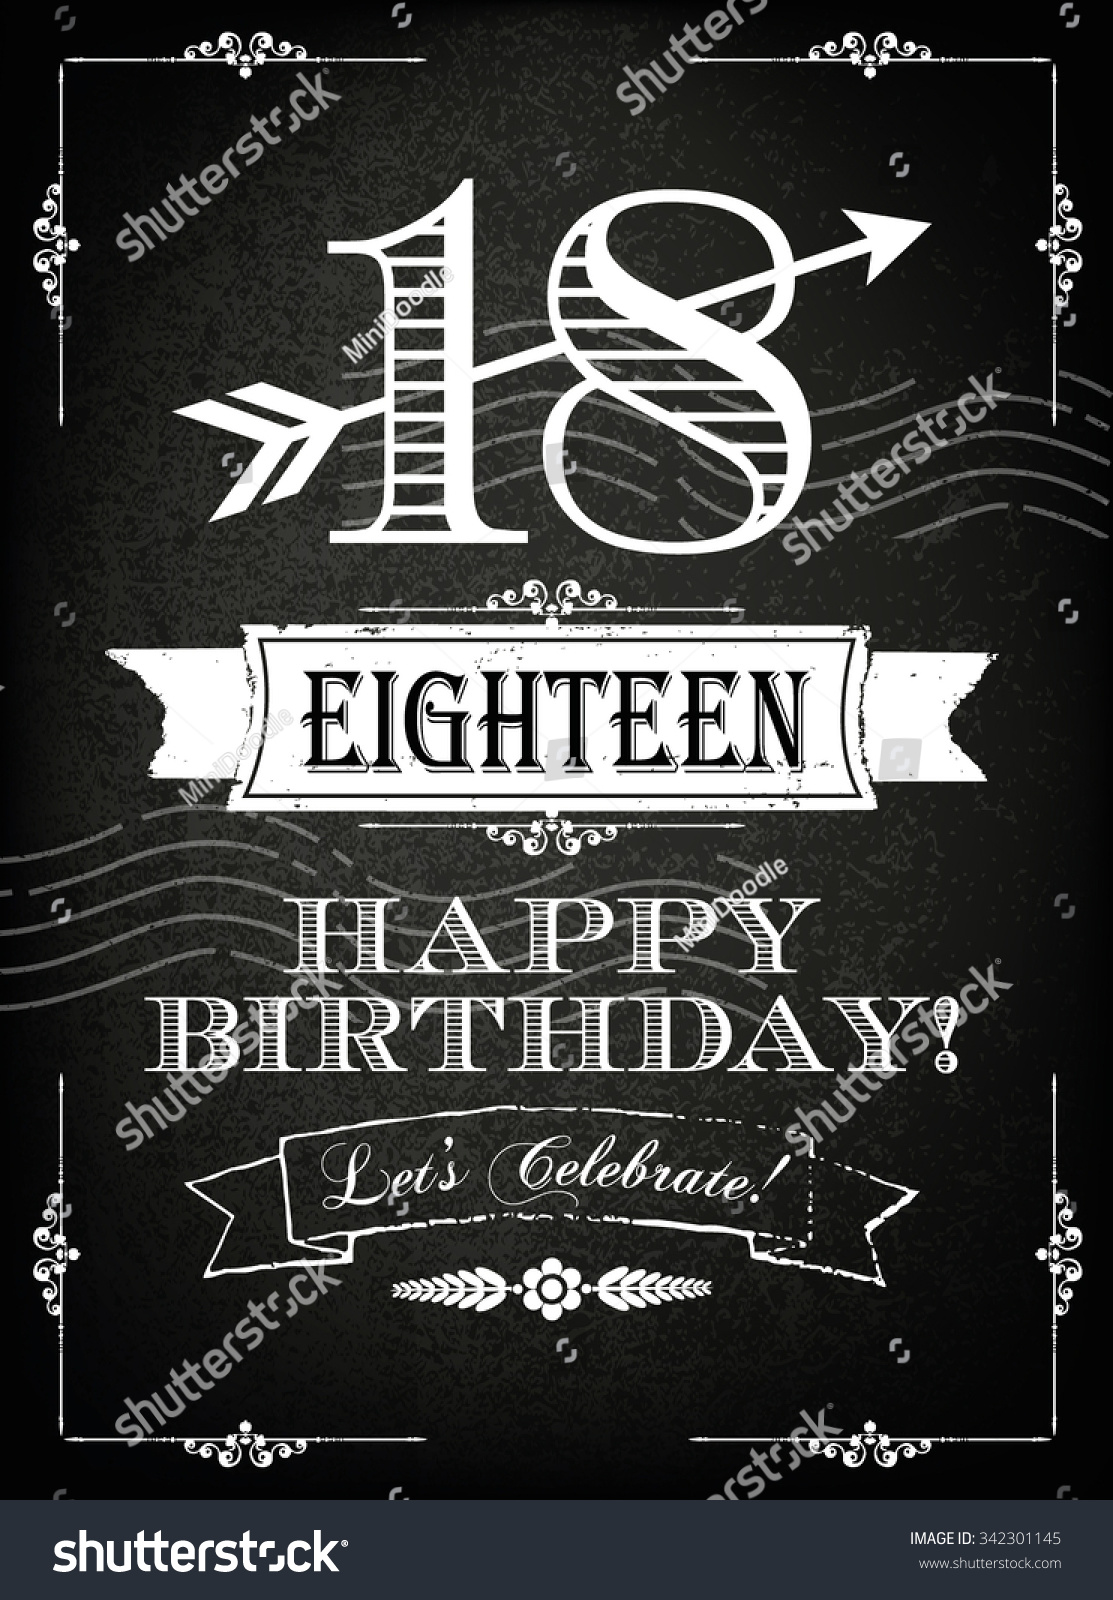 Golden Birthday Invitations as perfect invitation design